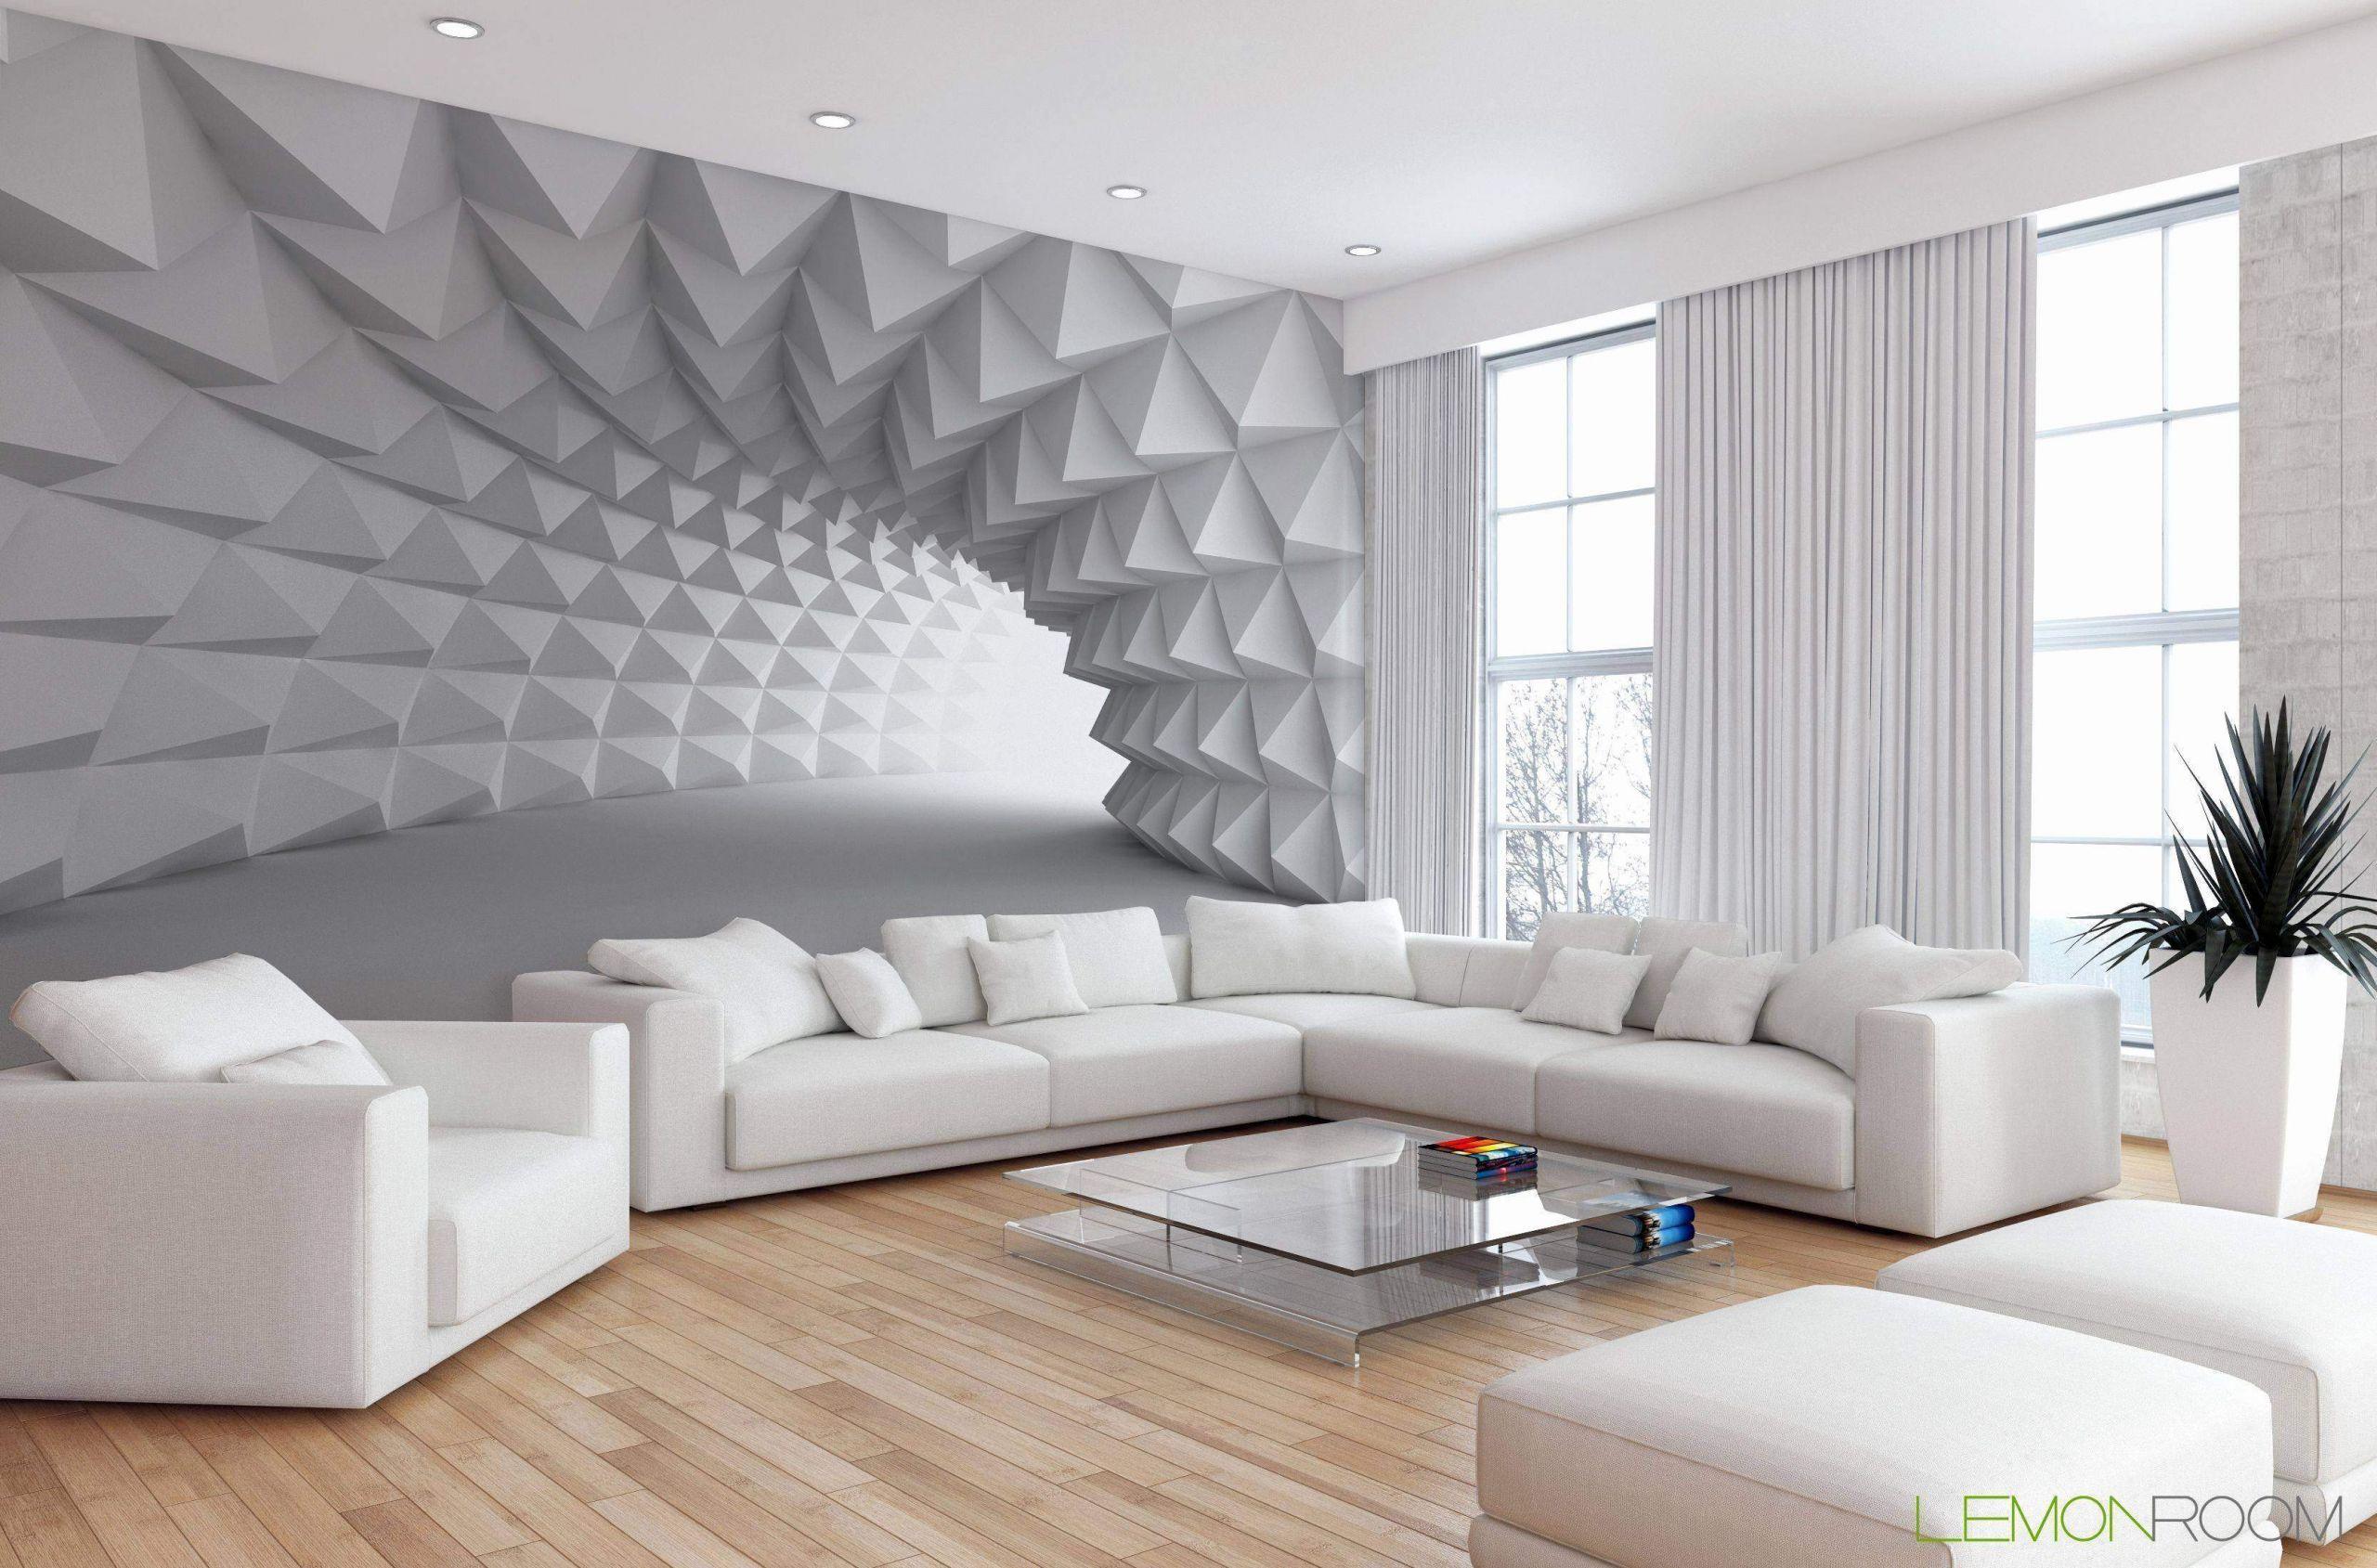 10+ Wohnzimmer Tapezieren Ideen in 10  Wallpaper living room